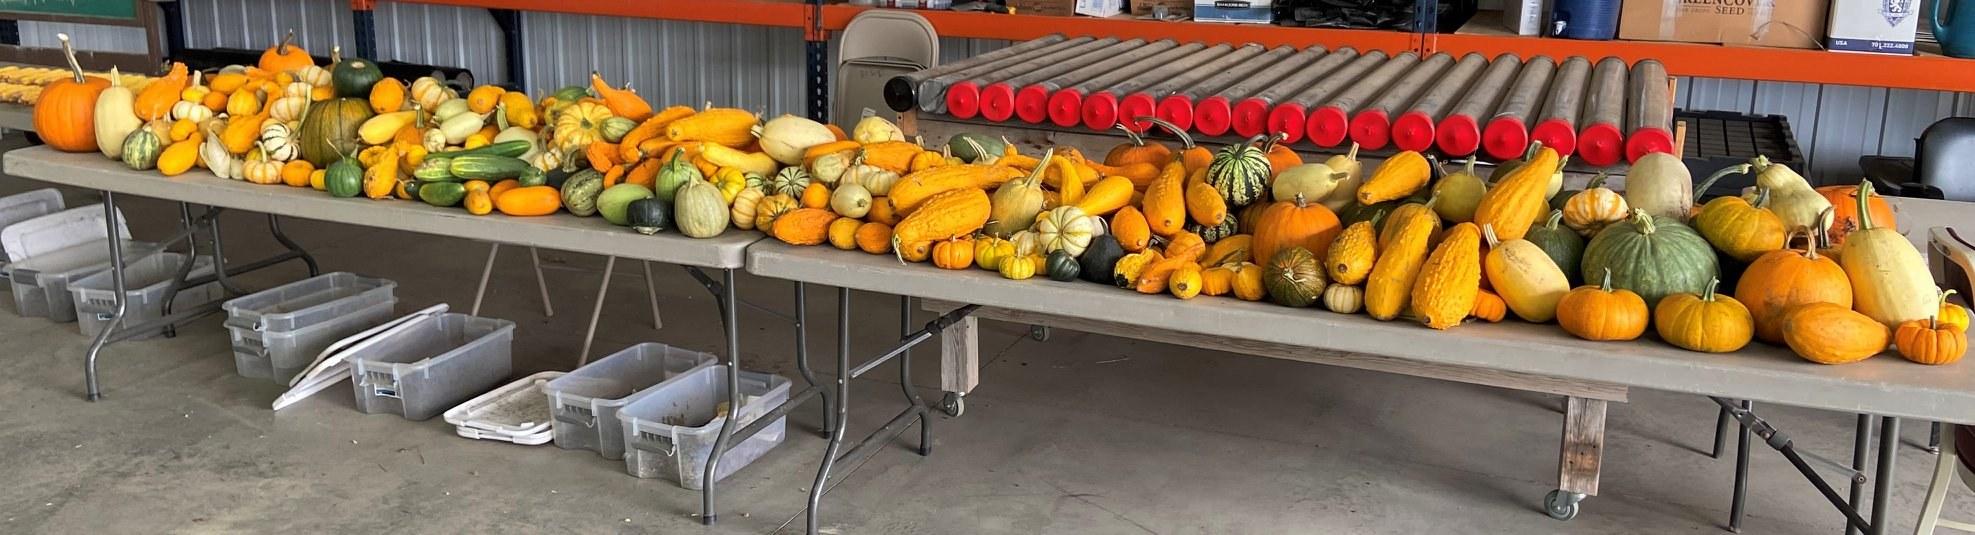 Milpa Harvest ND Menoken Farms